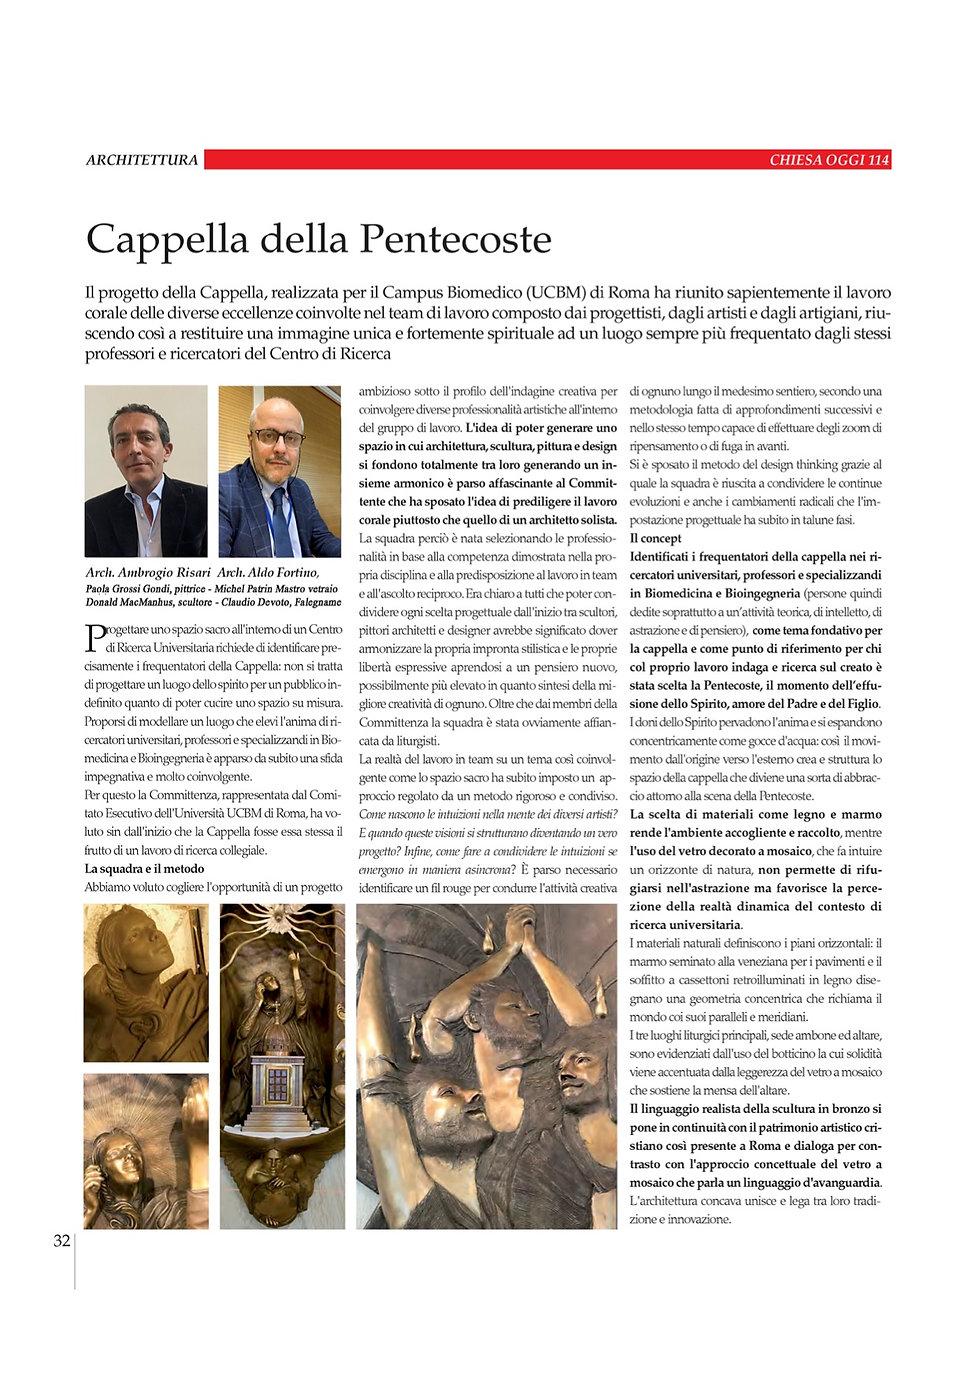 Cappella Centro Ricerche UCBM.jpg